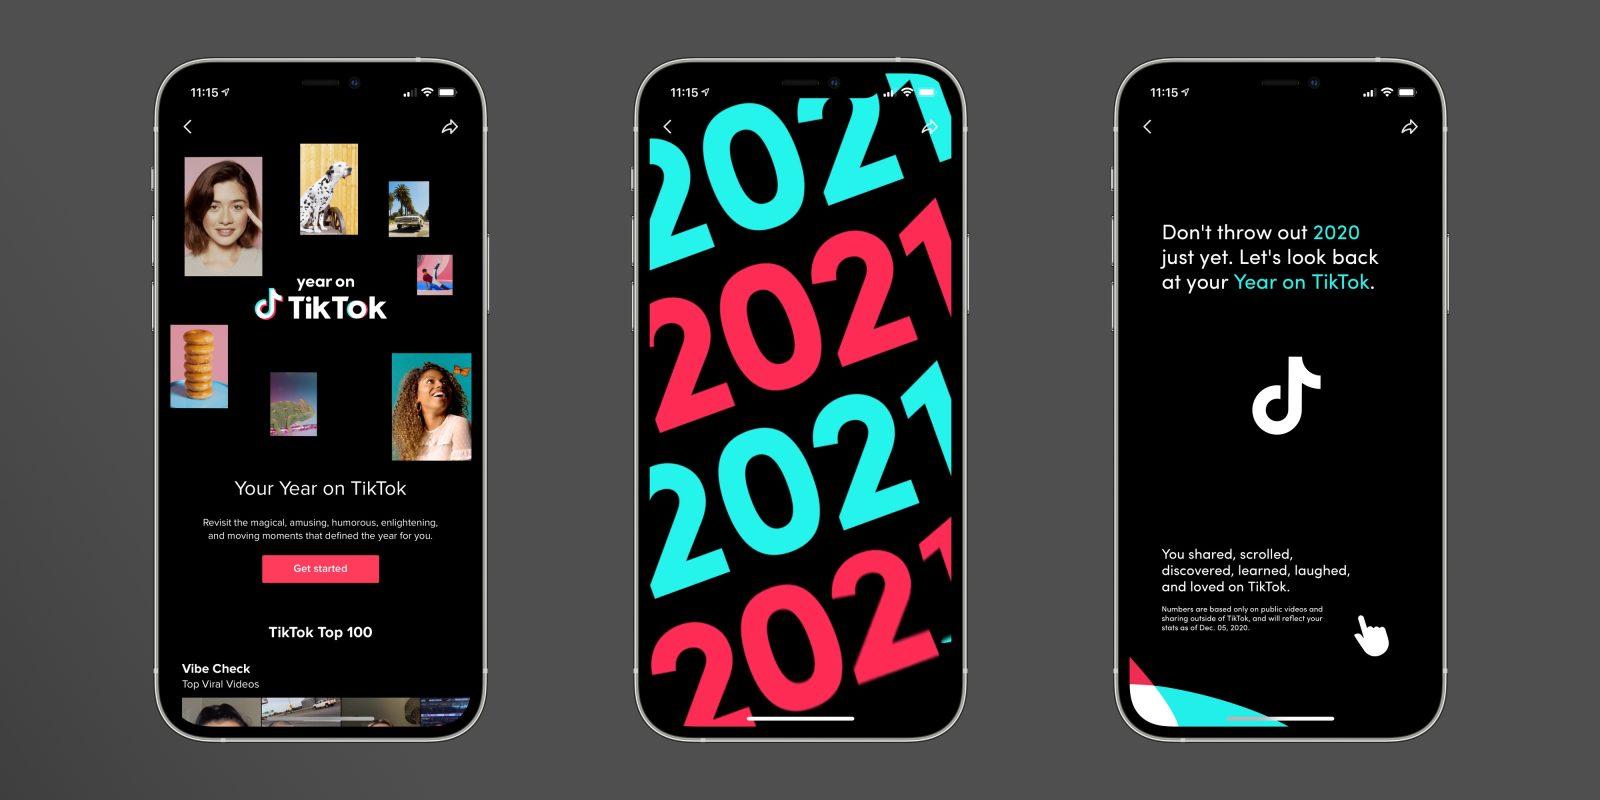 TikTok images on phone screens